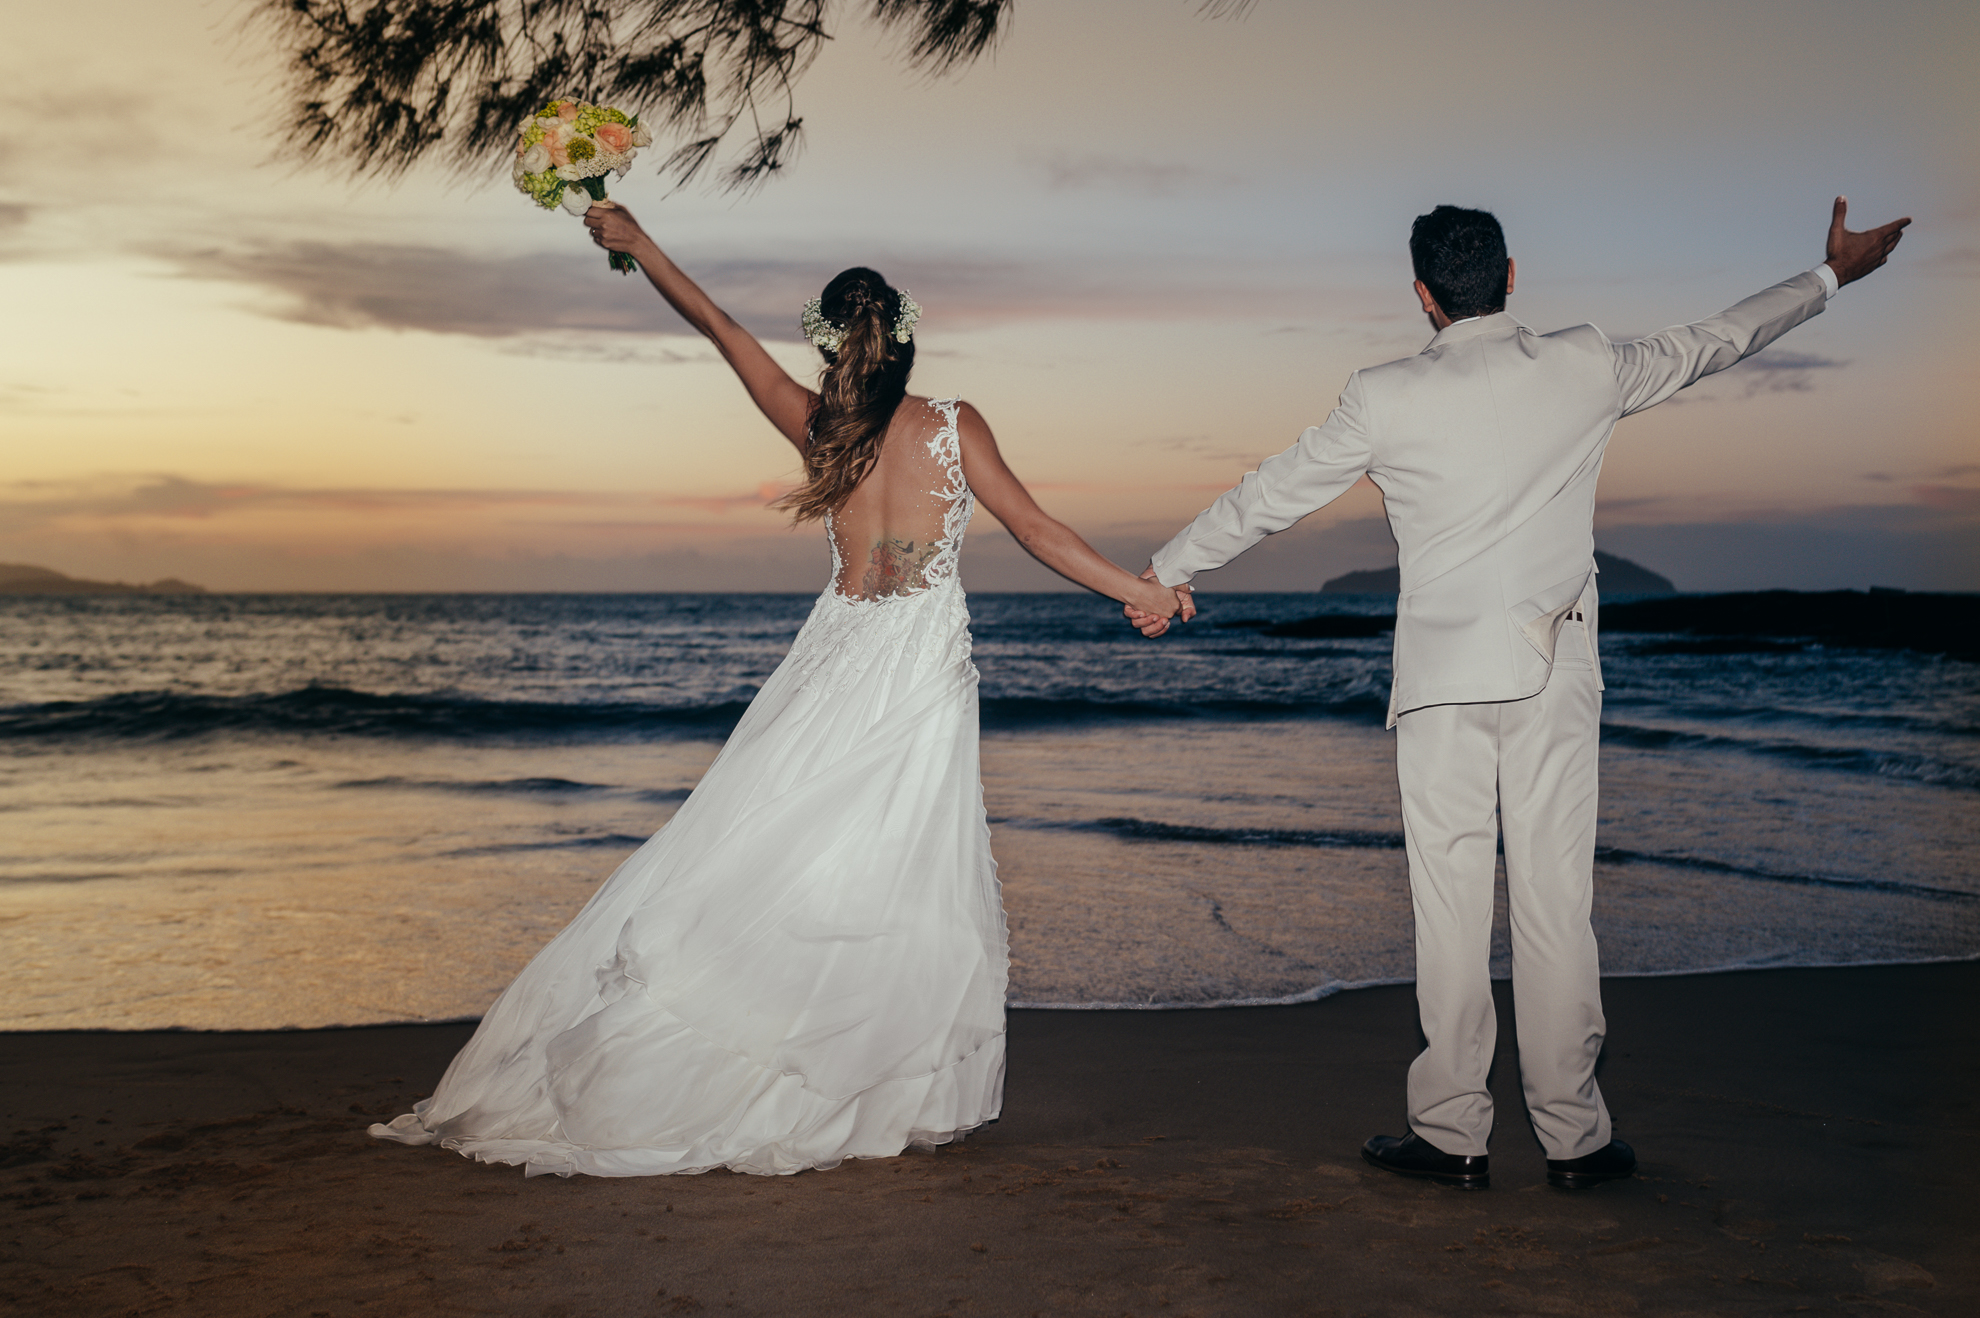 Pousada Praia da Tartaruga - Priscila & Guilherme (86)